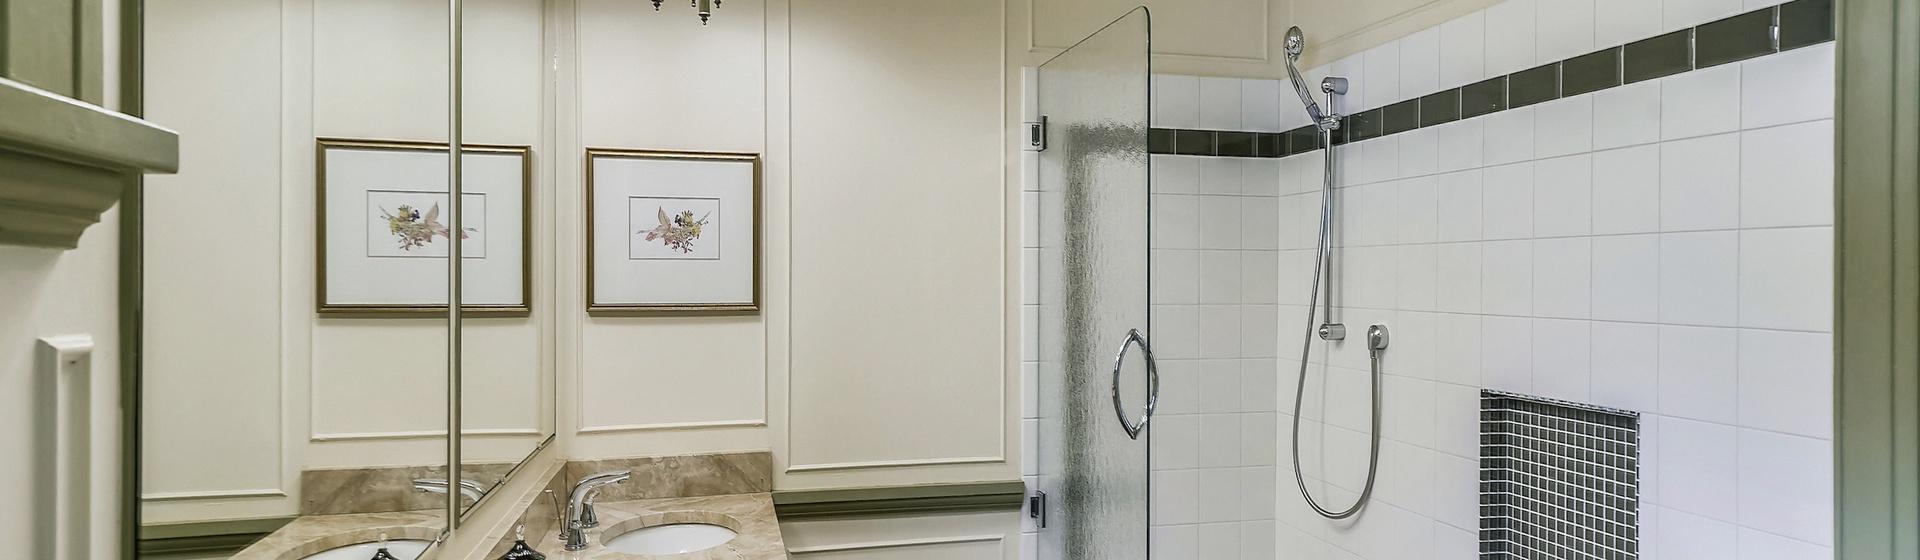 3.05-telluride-summer-haus-bathroom-A-2-web.jpg